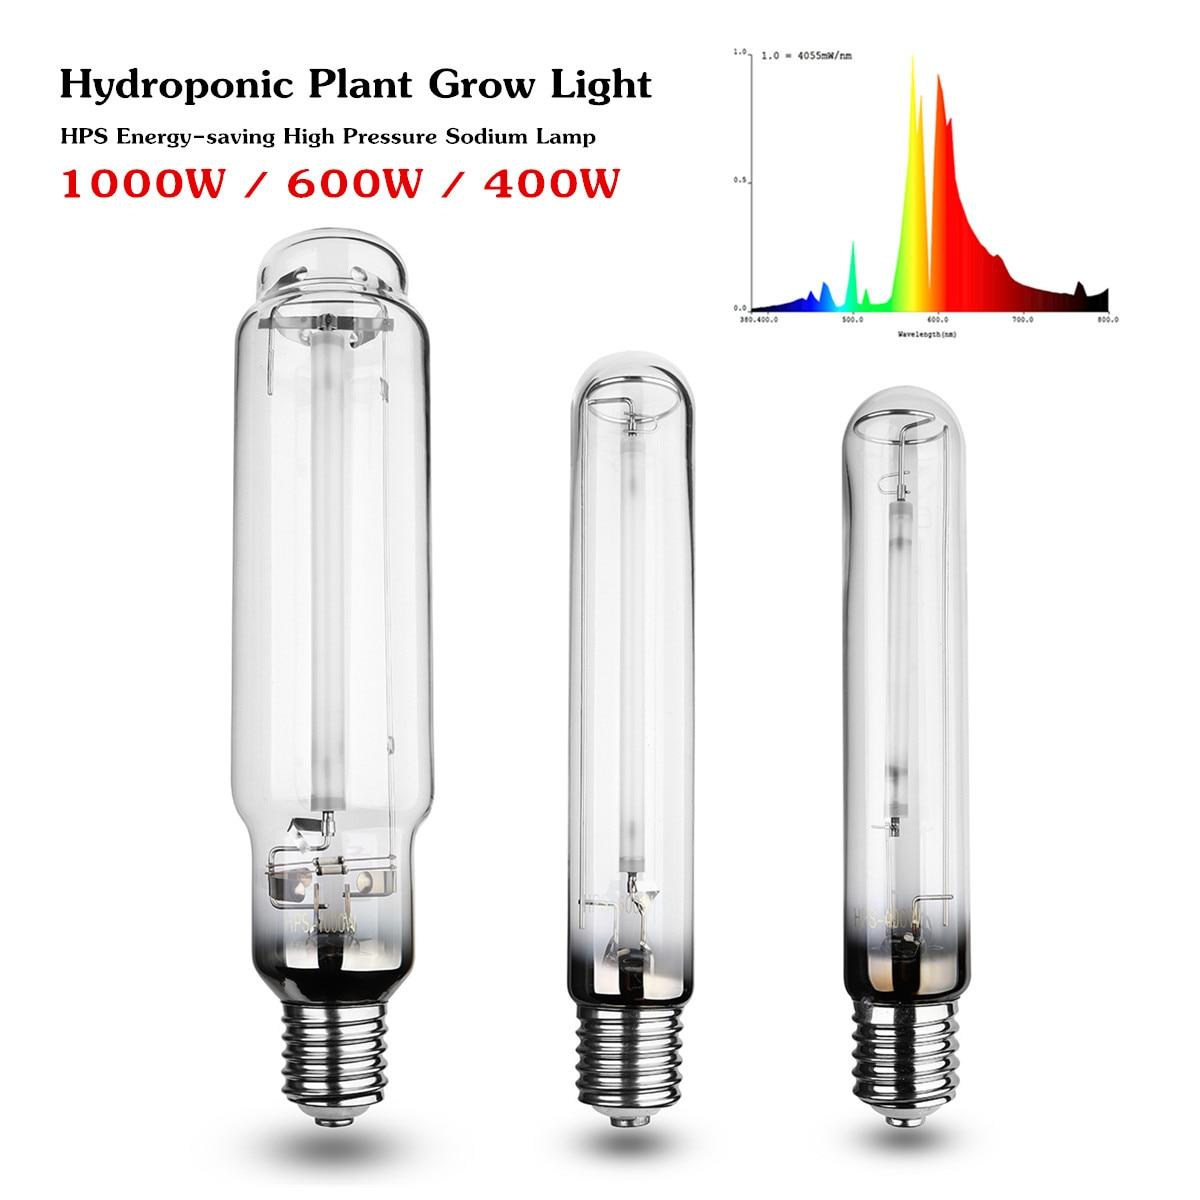 250W E40 HPS Grow Light Bulb Ballast Garden Indoor Plant Growing Lamp Greenhouse